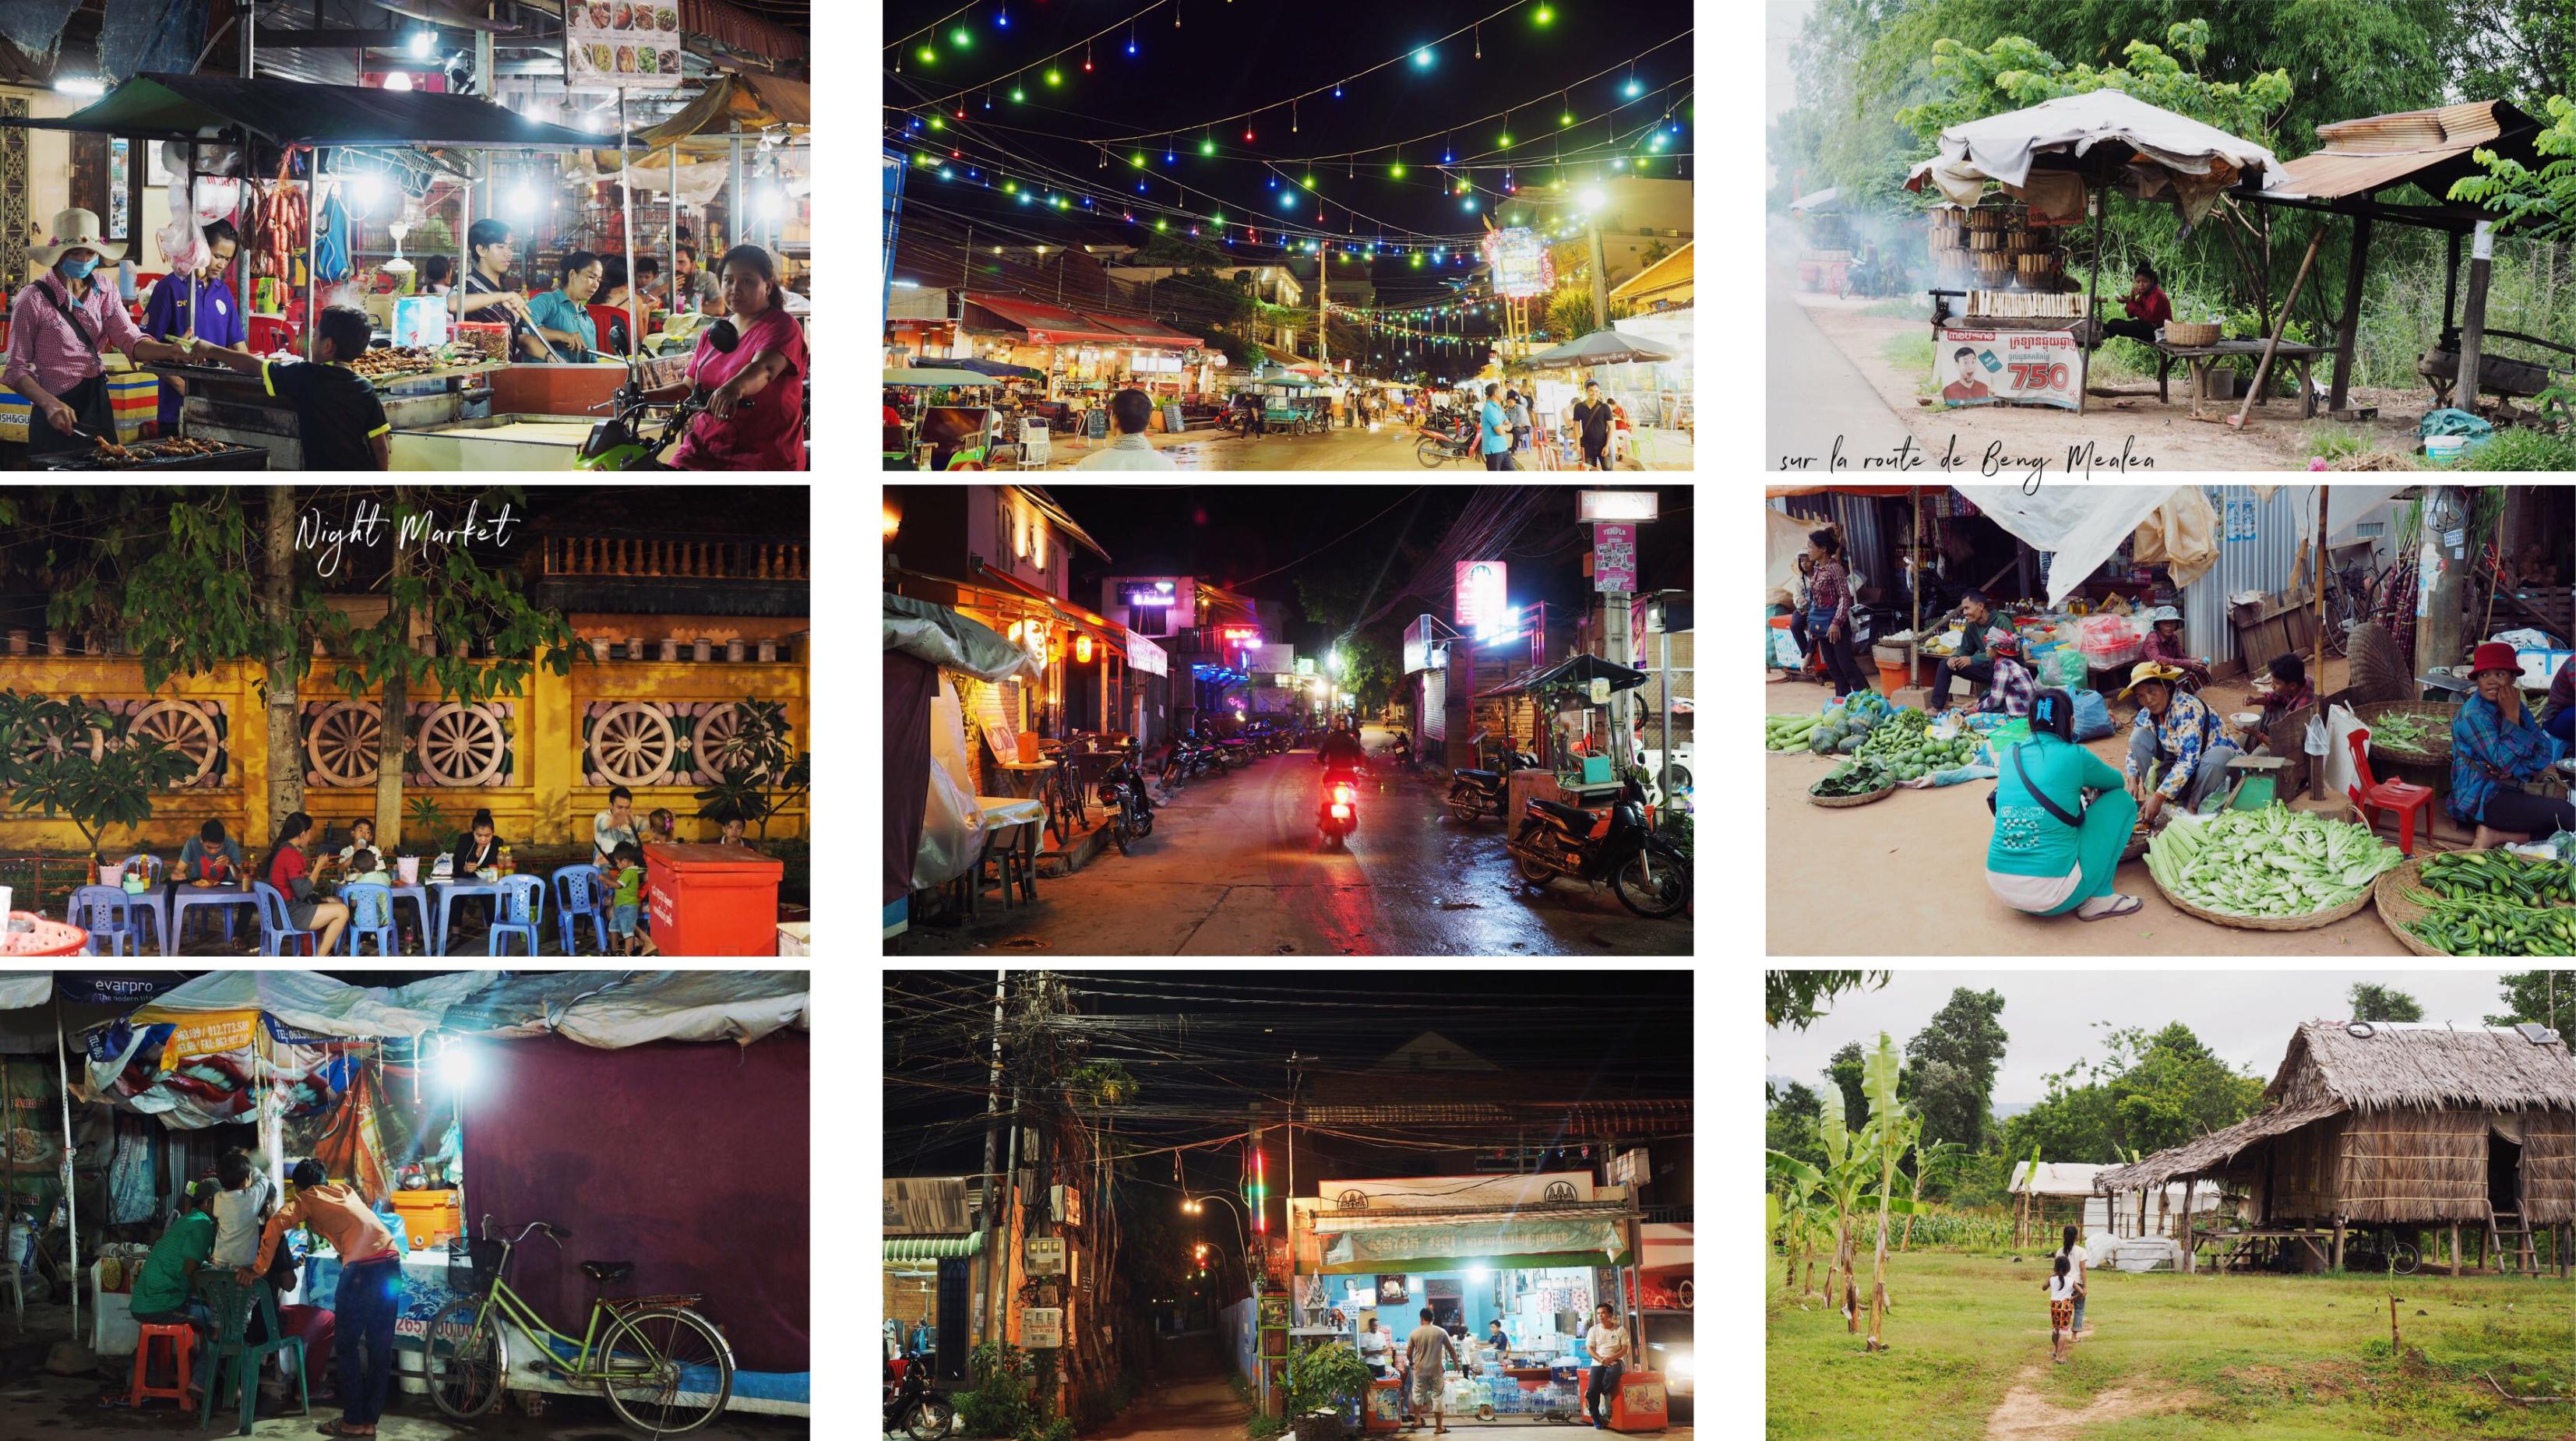 découvrir siem reap - visiter le nightmarket - cambodge